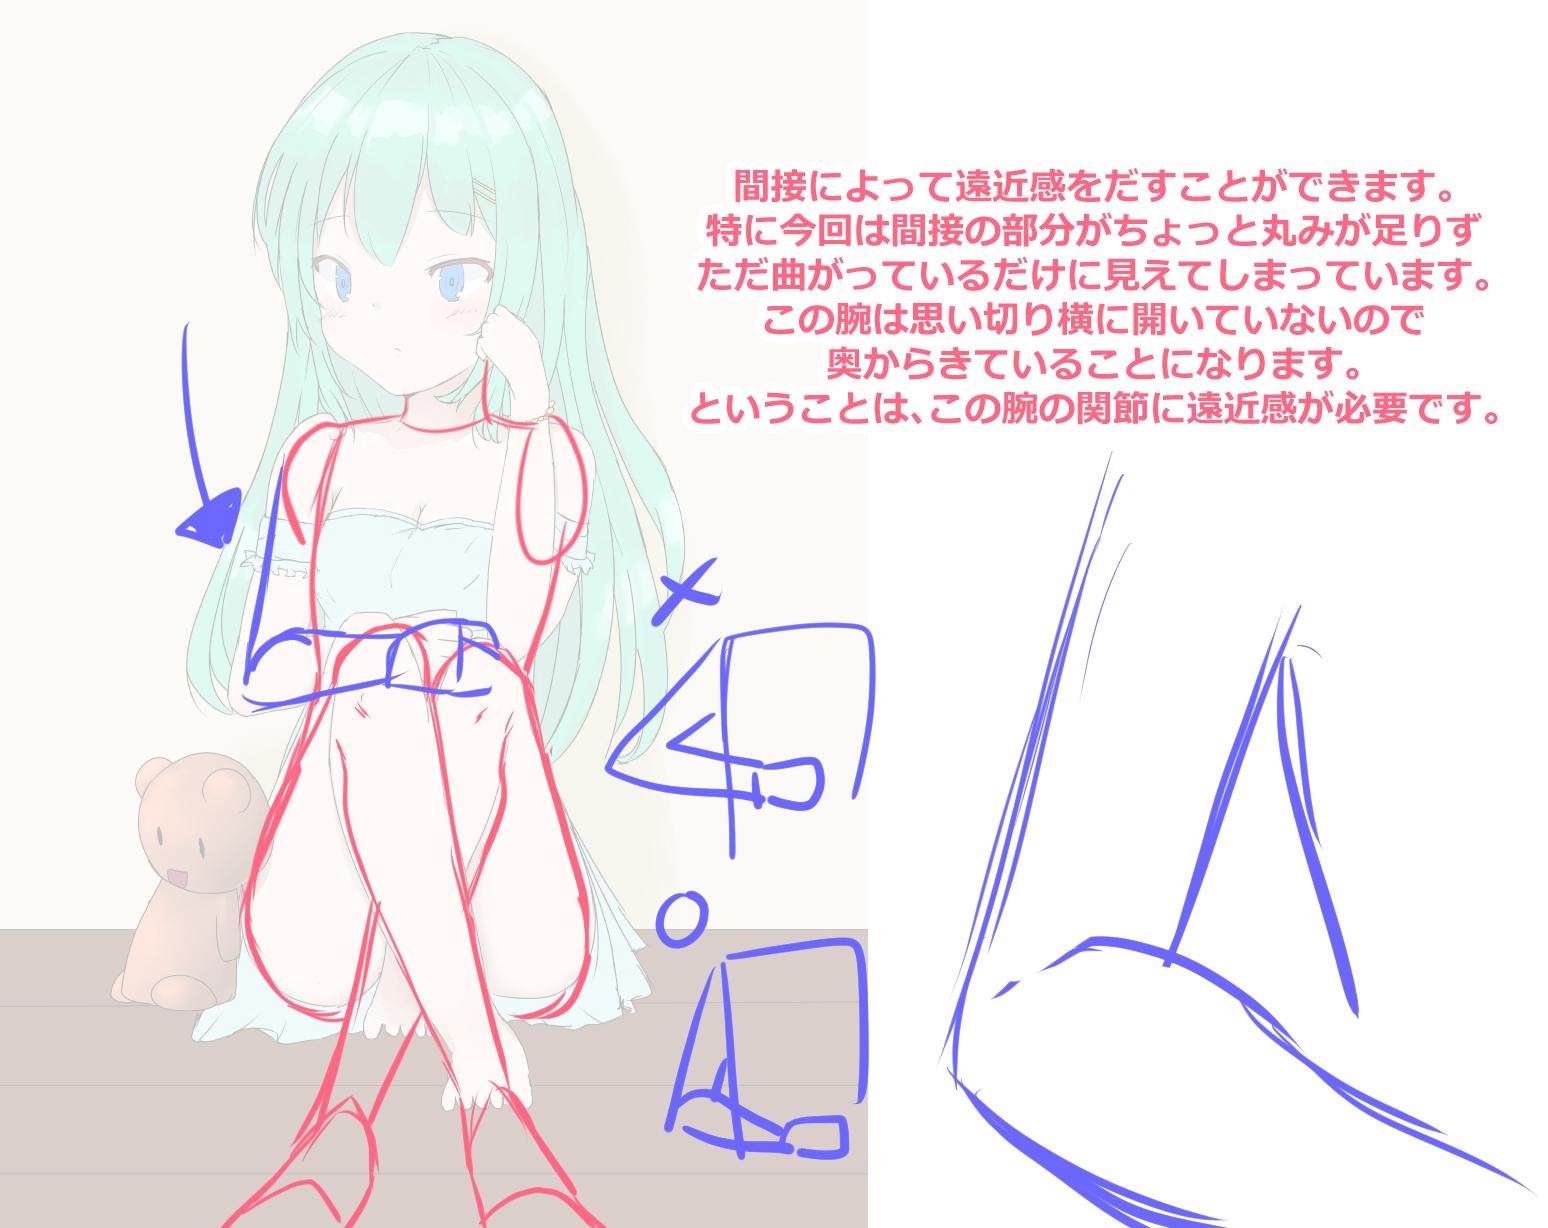 H2qkrzm8_4.jpg